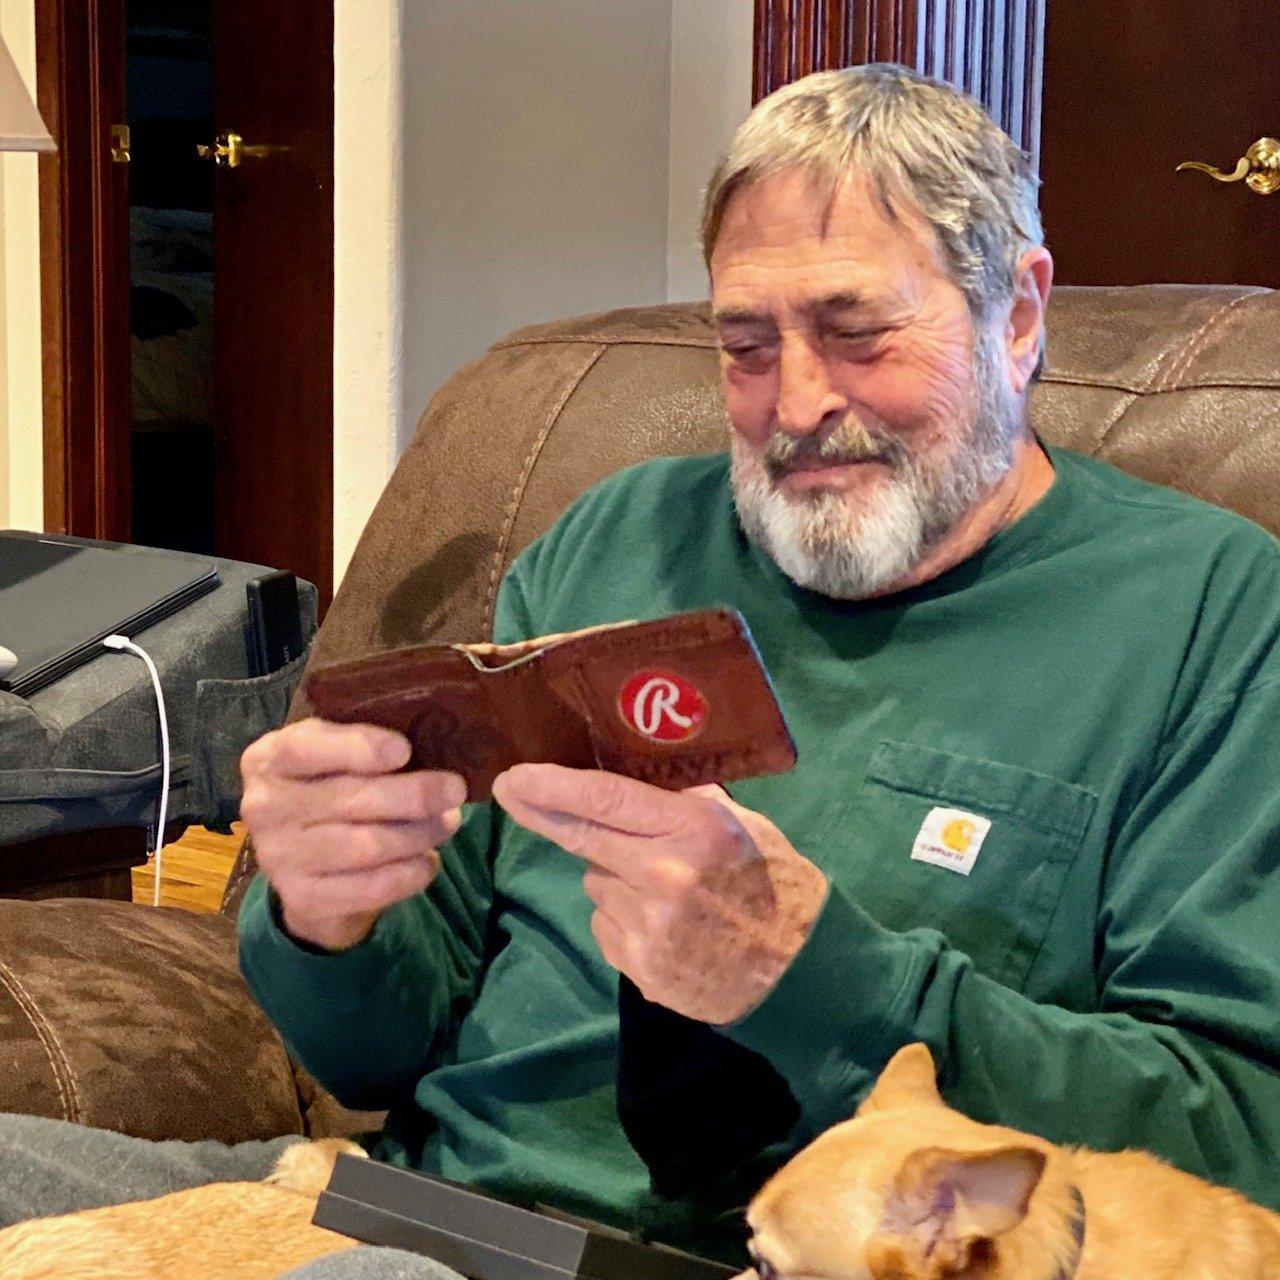 Dad gets special baseball wallet from Vvego.com